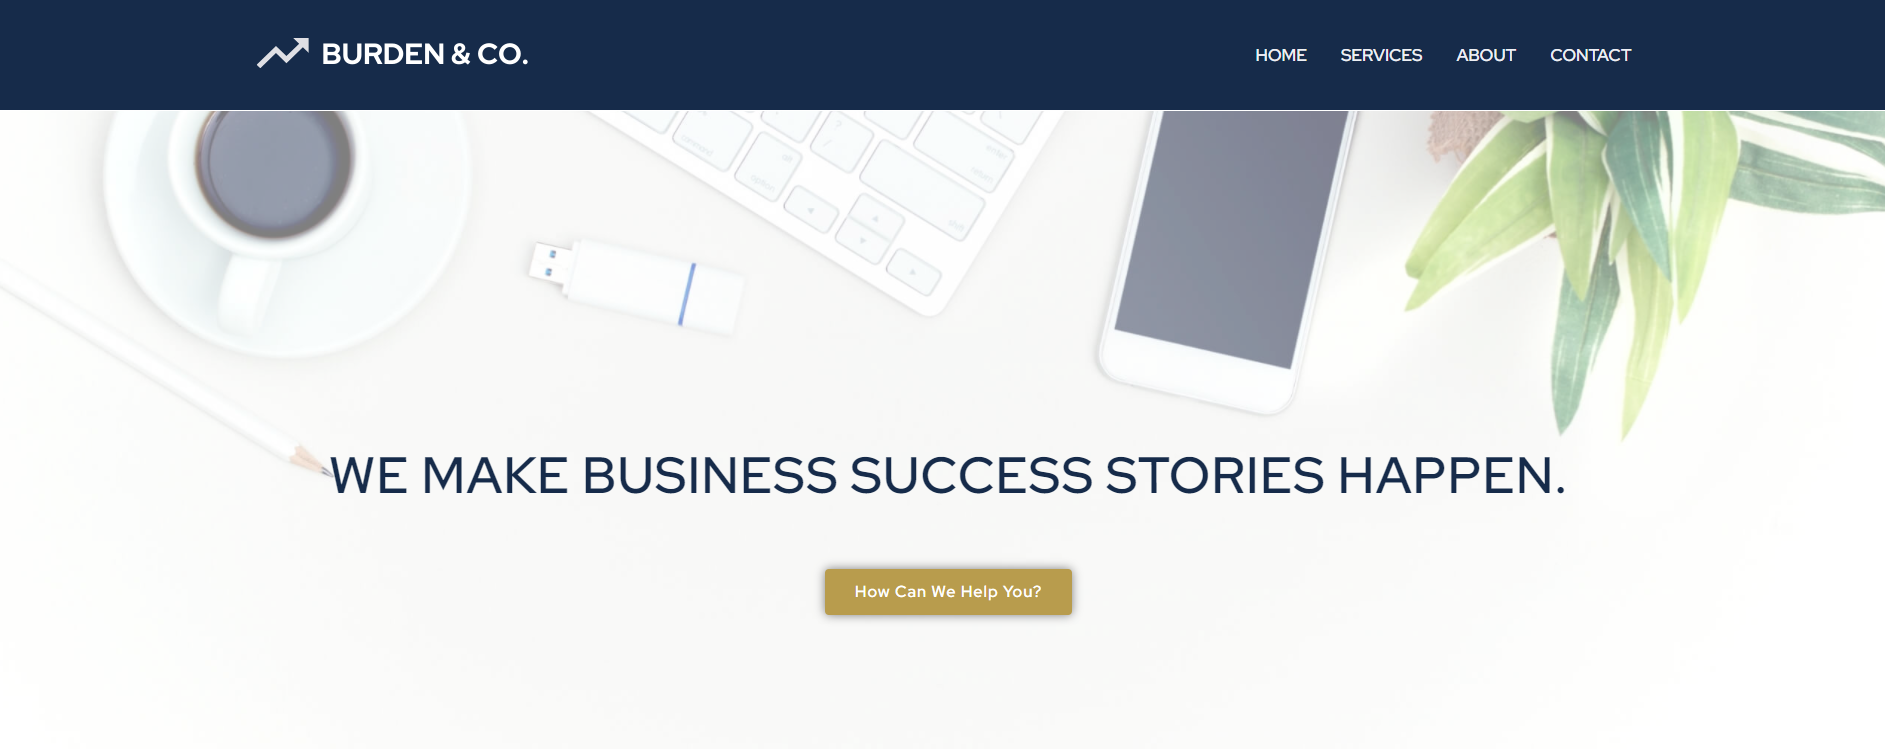 burdenandco.com Homepage